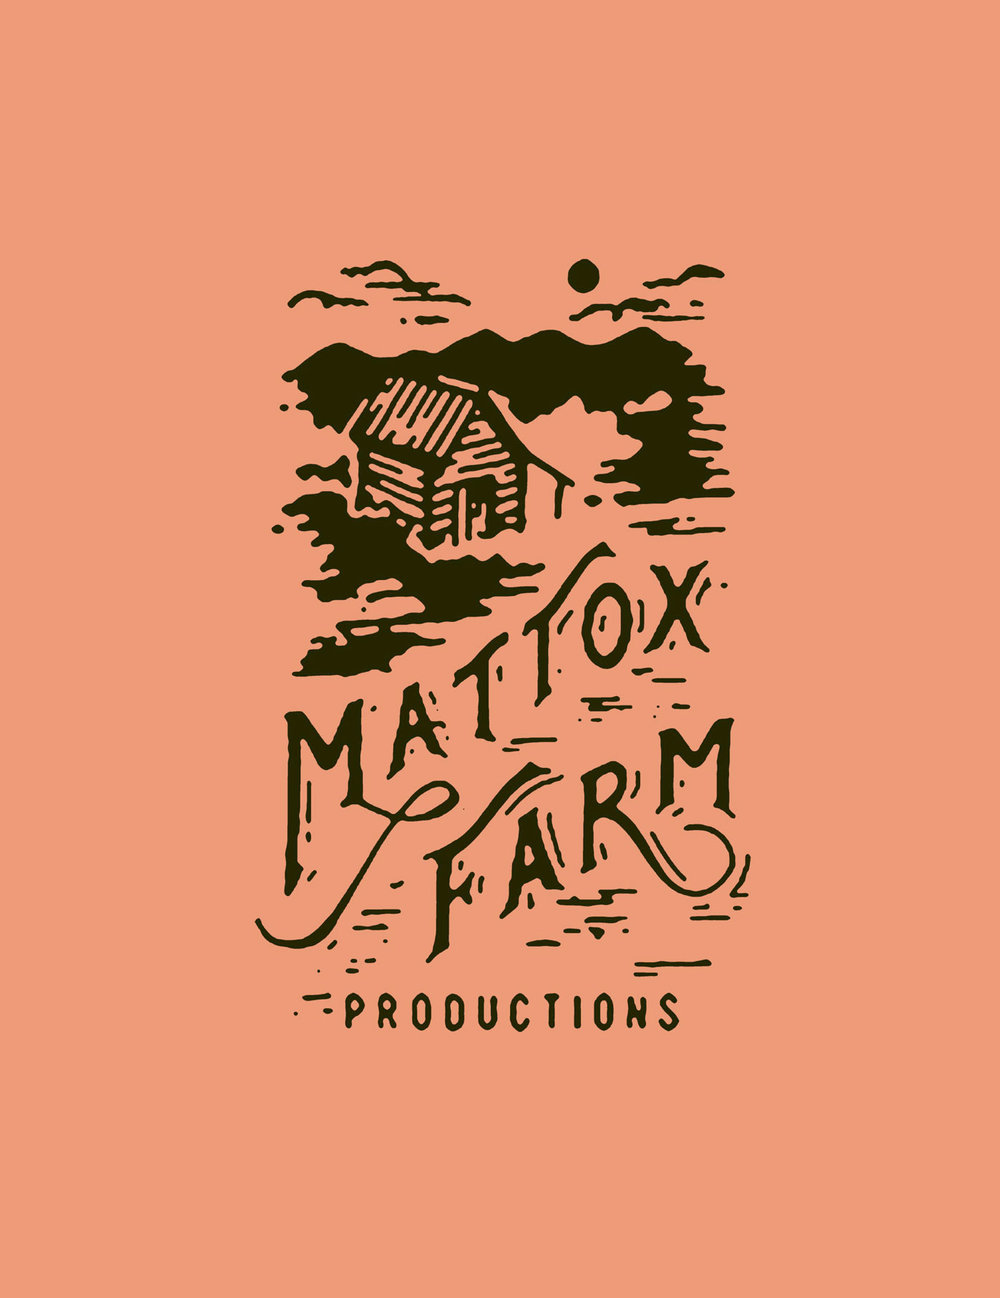 Mattox_Farm_Logo_Final-copy-2.jpg